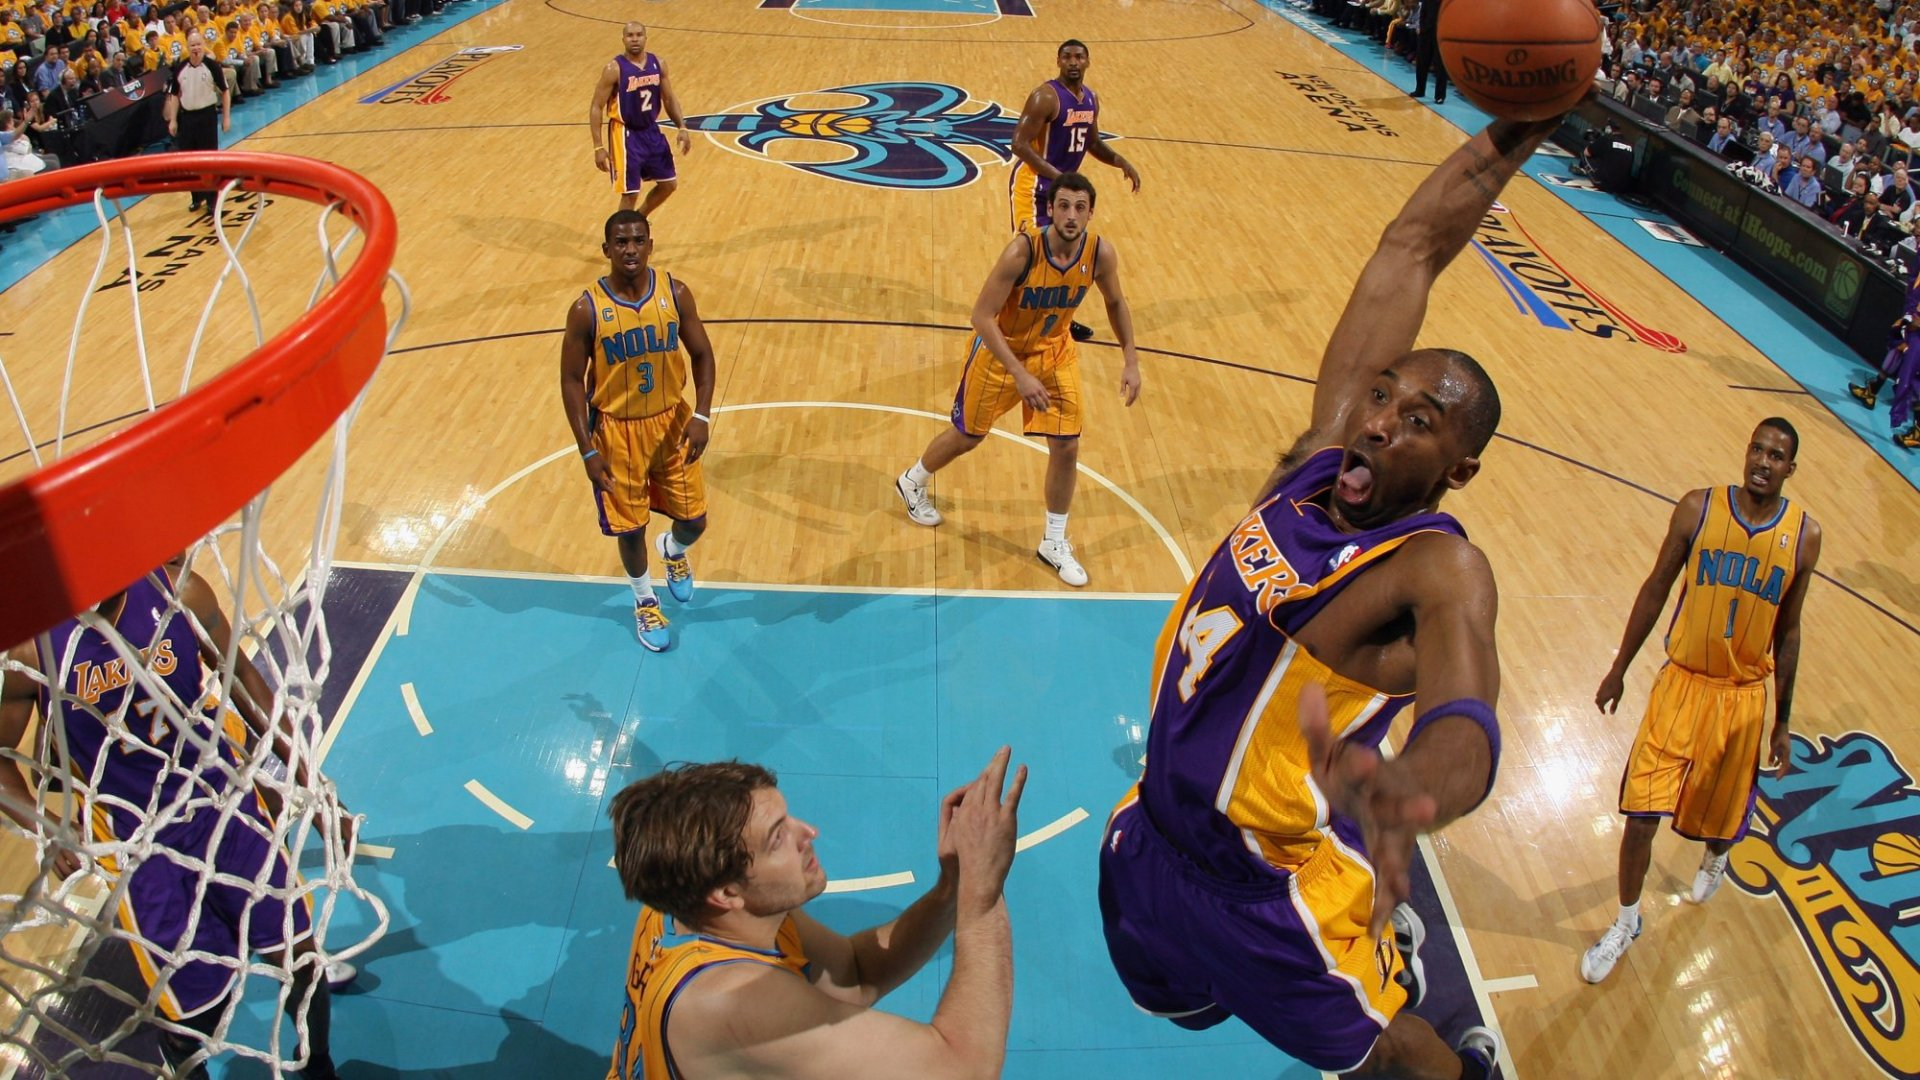 How to Break Rules and Succeed Like Kobe Bryant